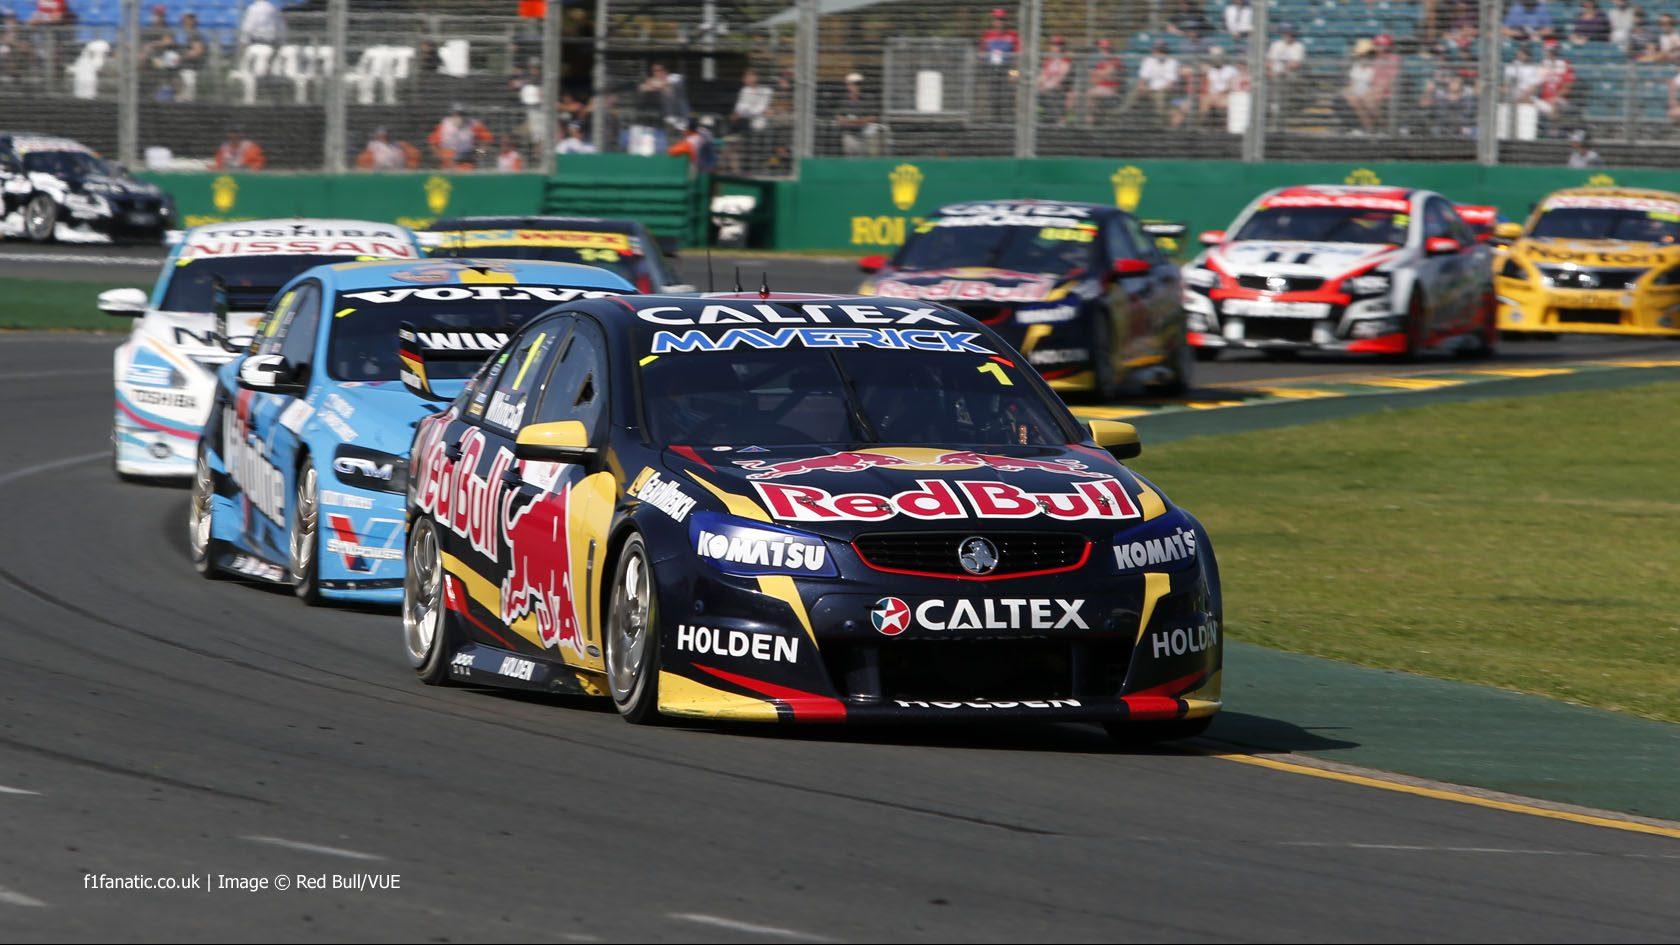 Jamie Whincup, Holden, Melbourne, Australian V8 Supercars, 2014